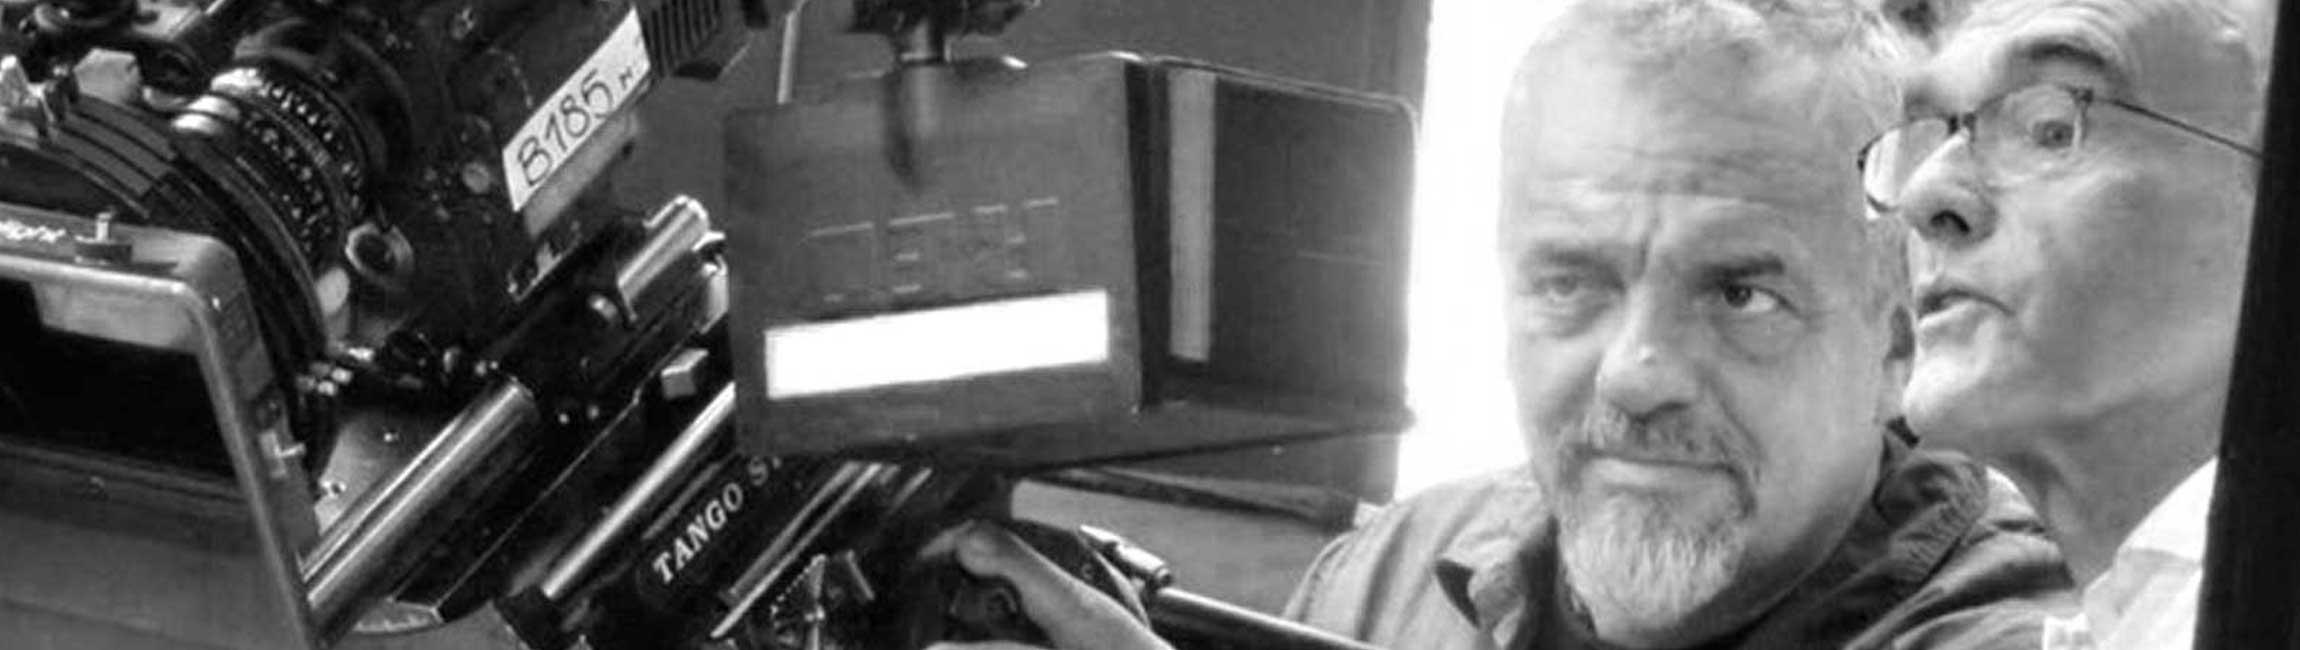 Alex Brambilla - Camera and Steadicam Operator